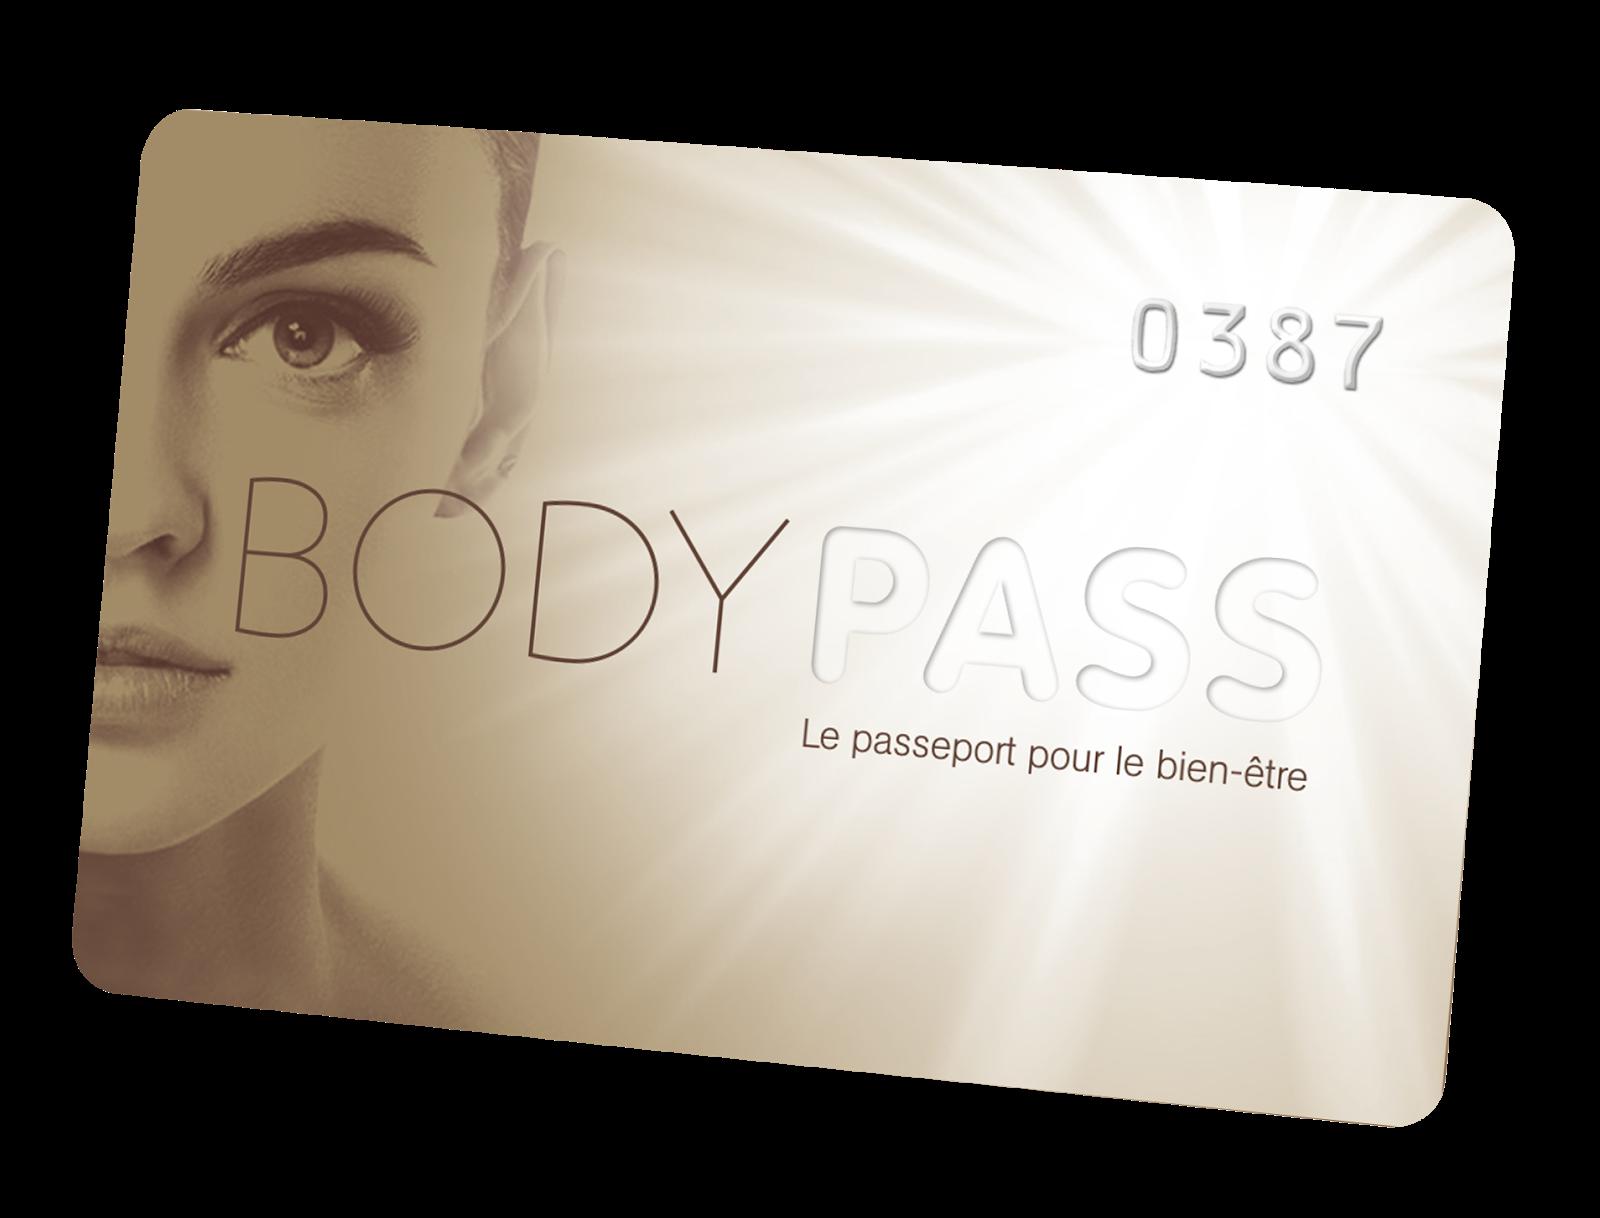 BodyPass 2017/2018